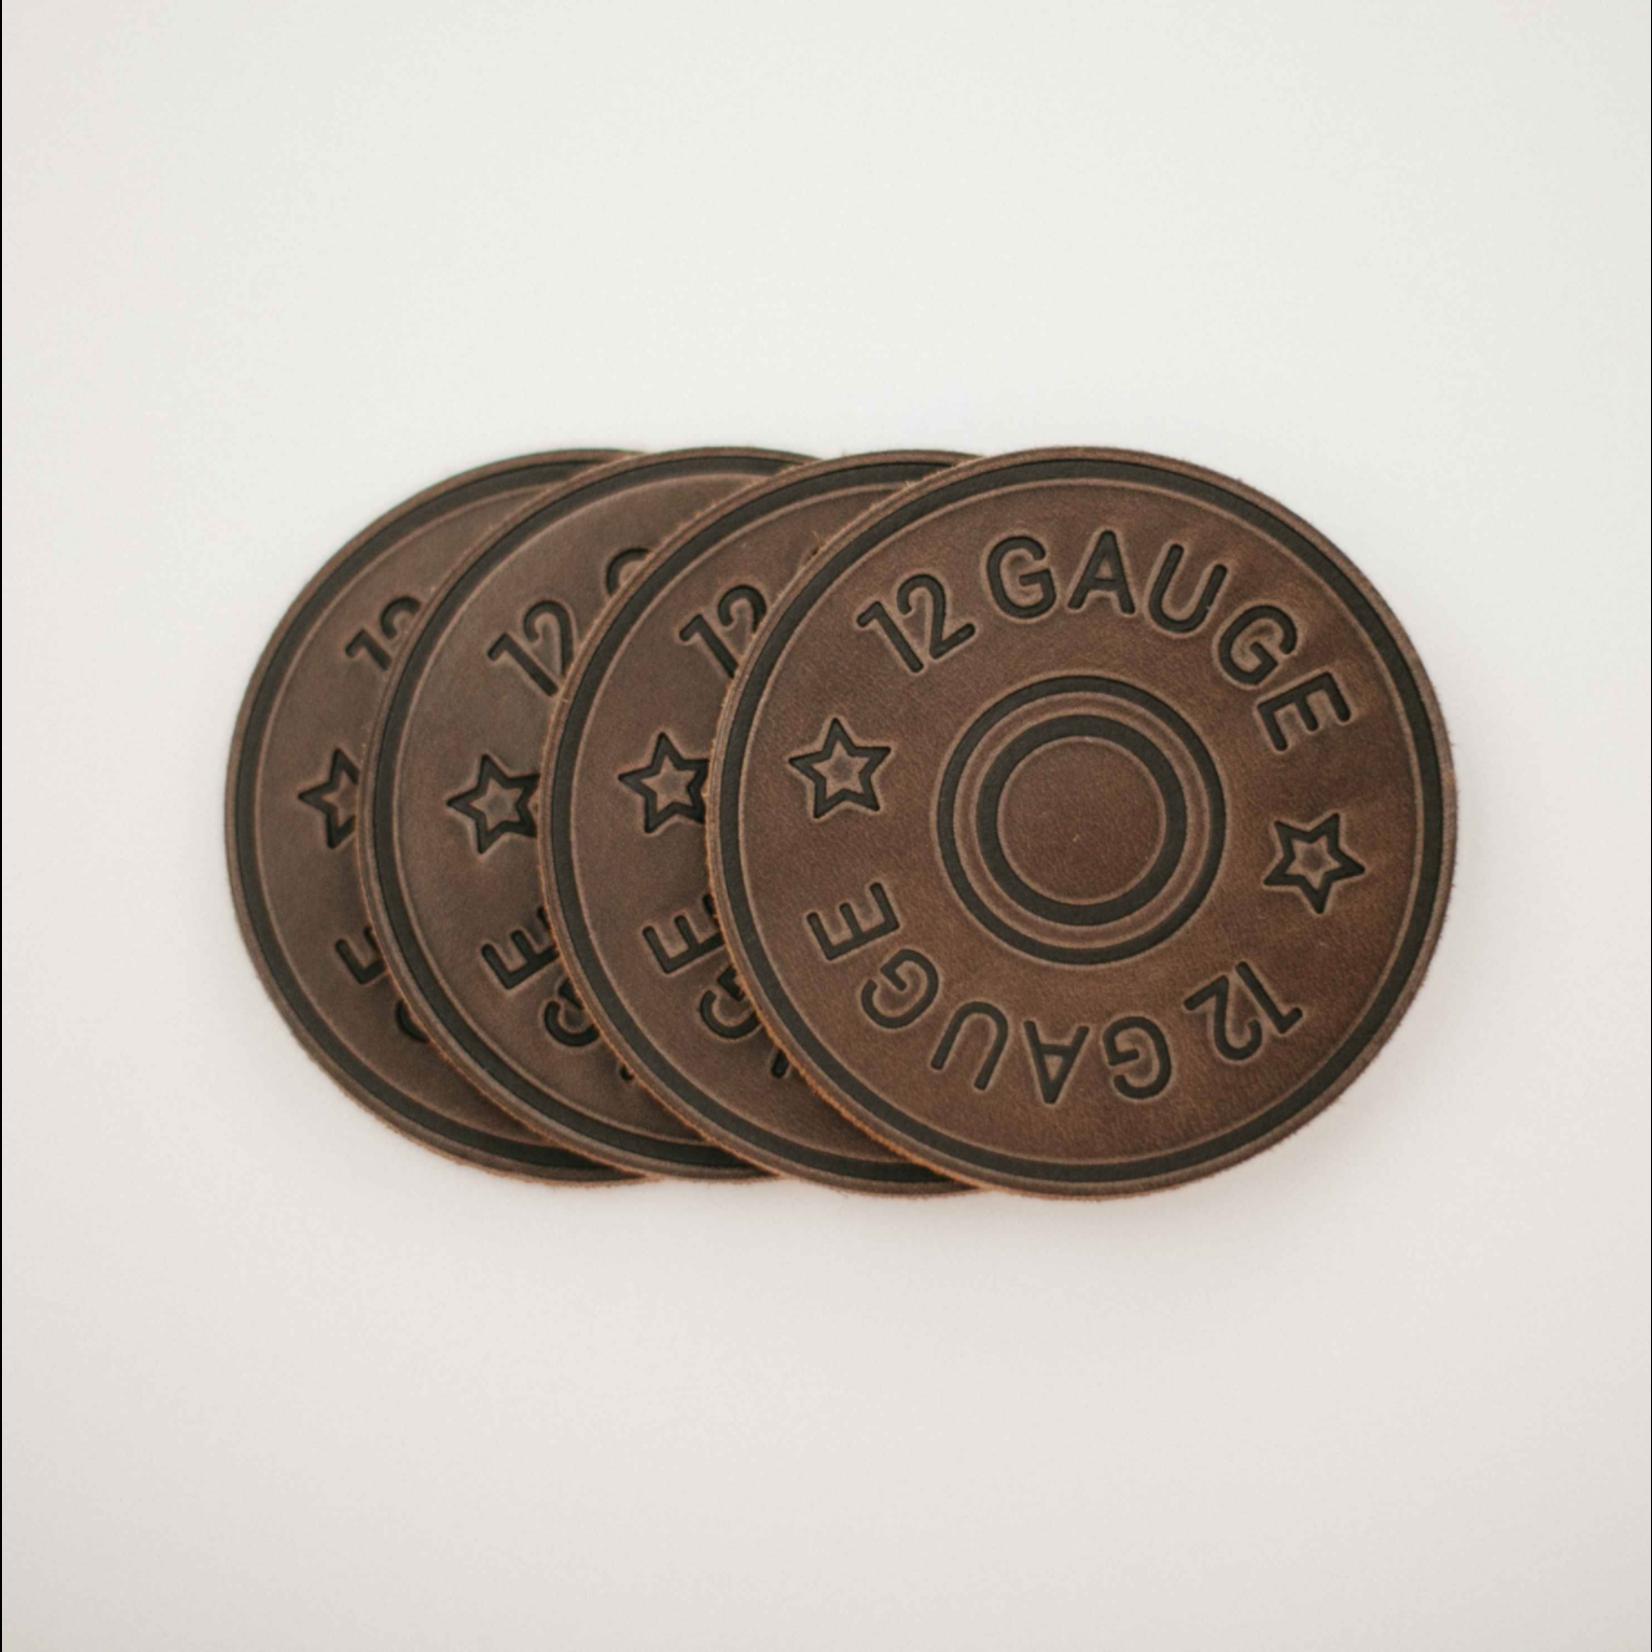 Clayton and Crume 12 Gauge Coasters